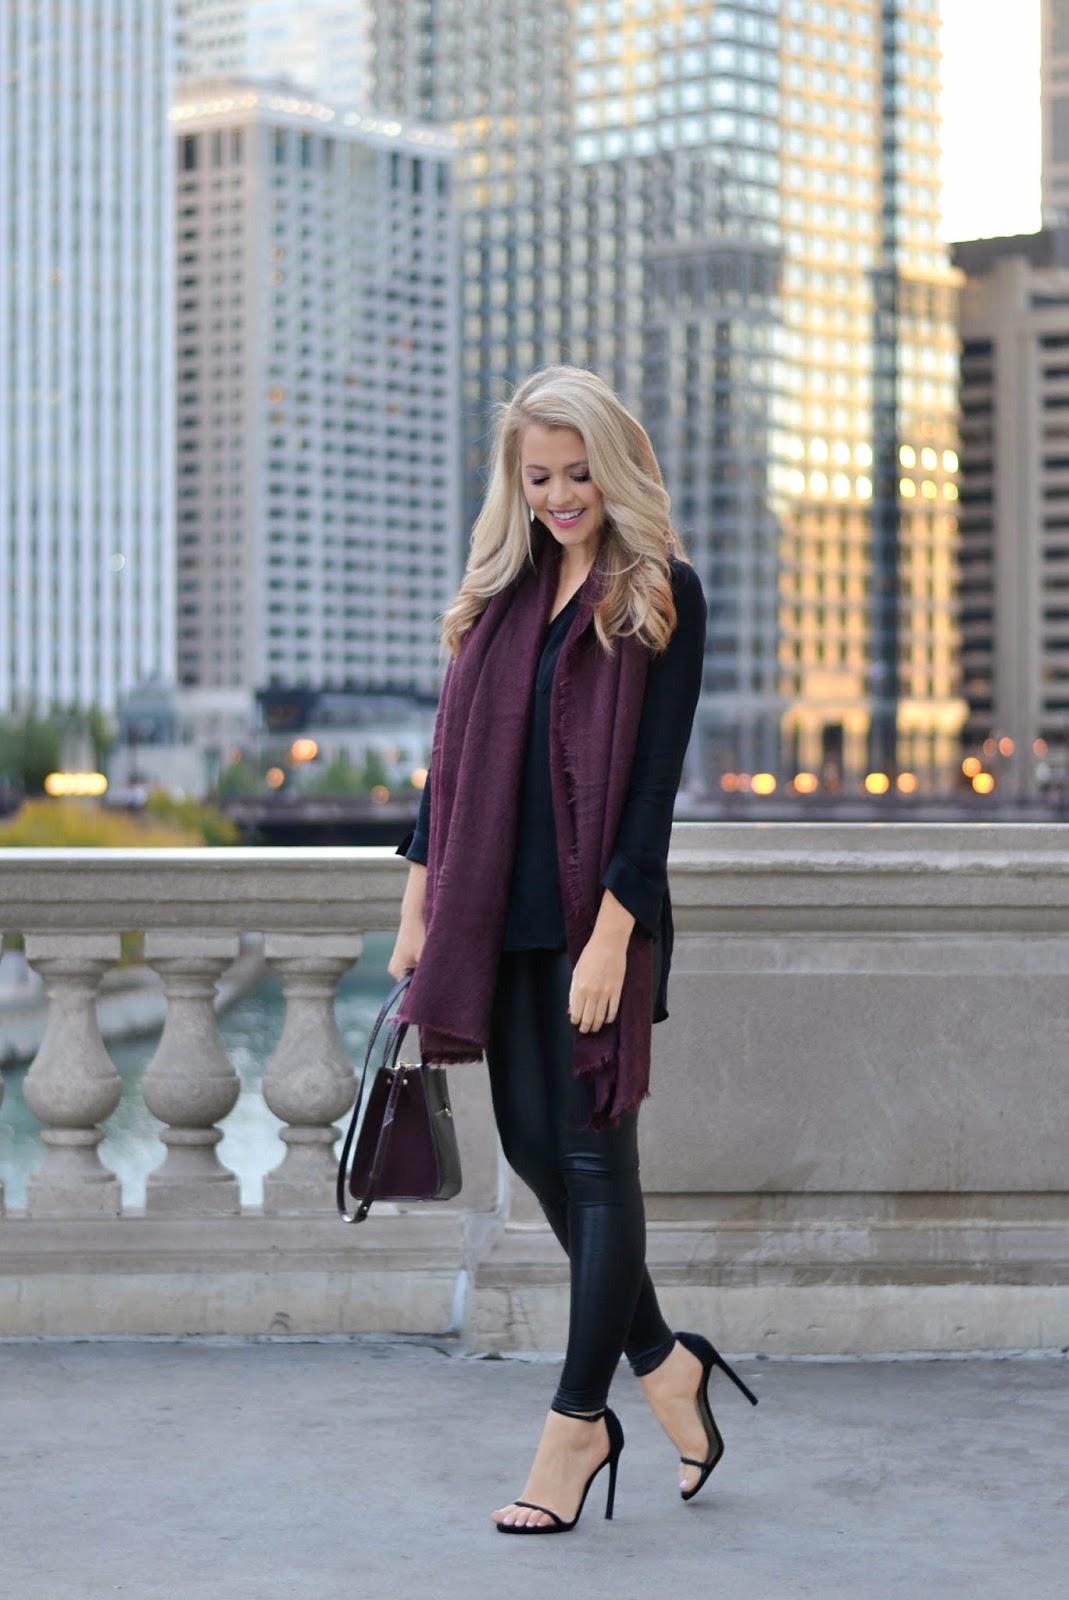 laura platt chicago fashion blogger